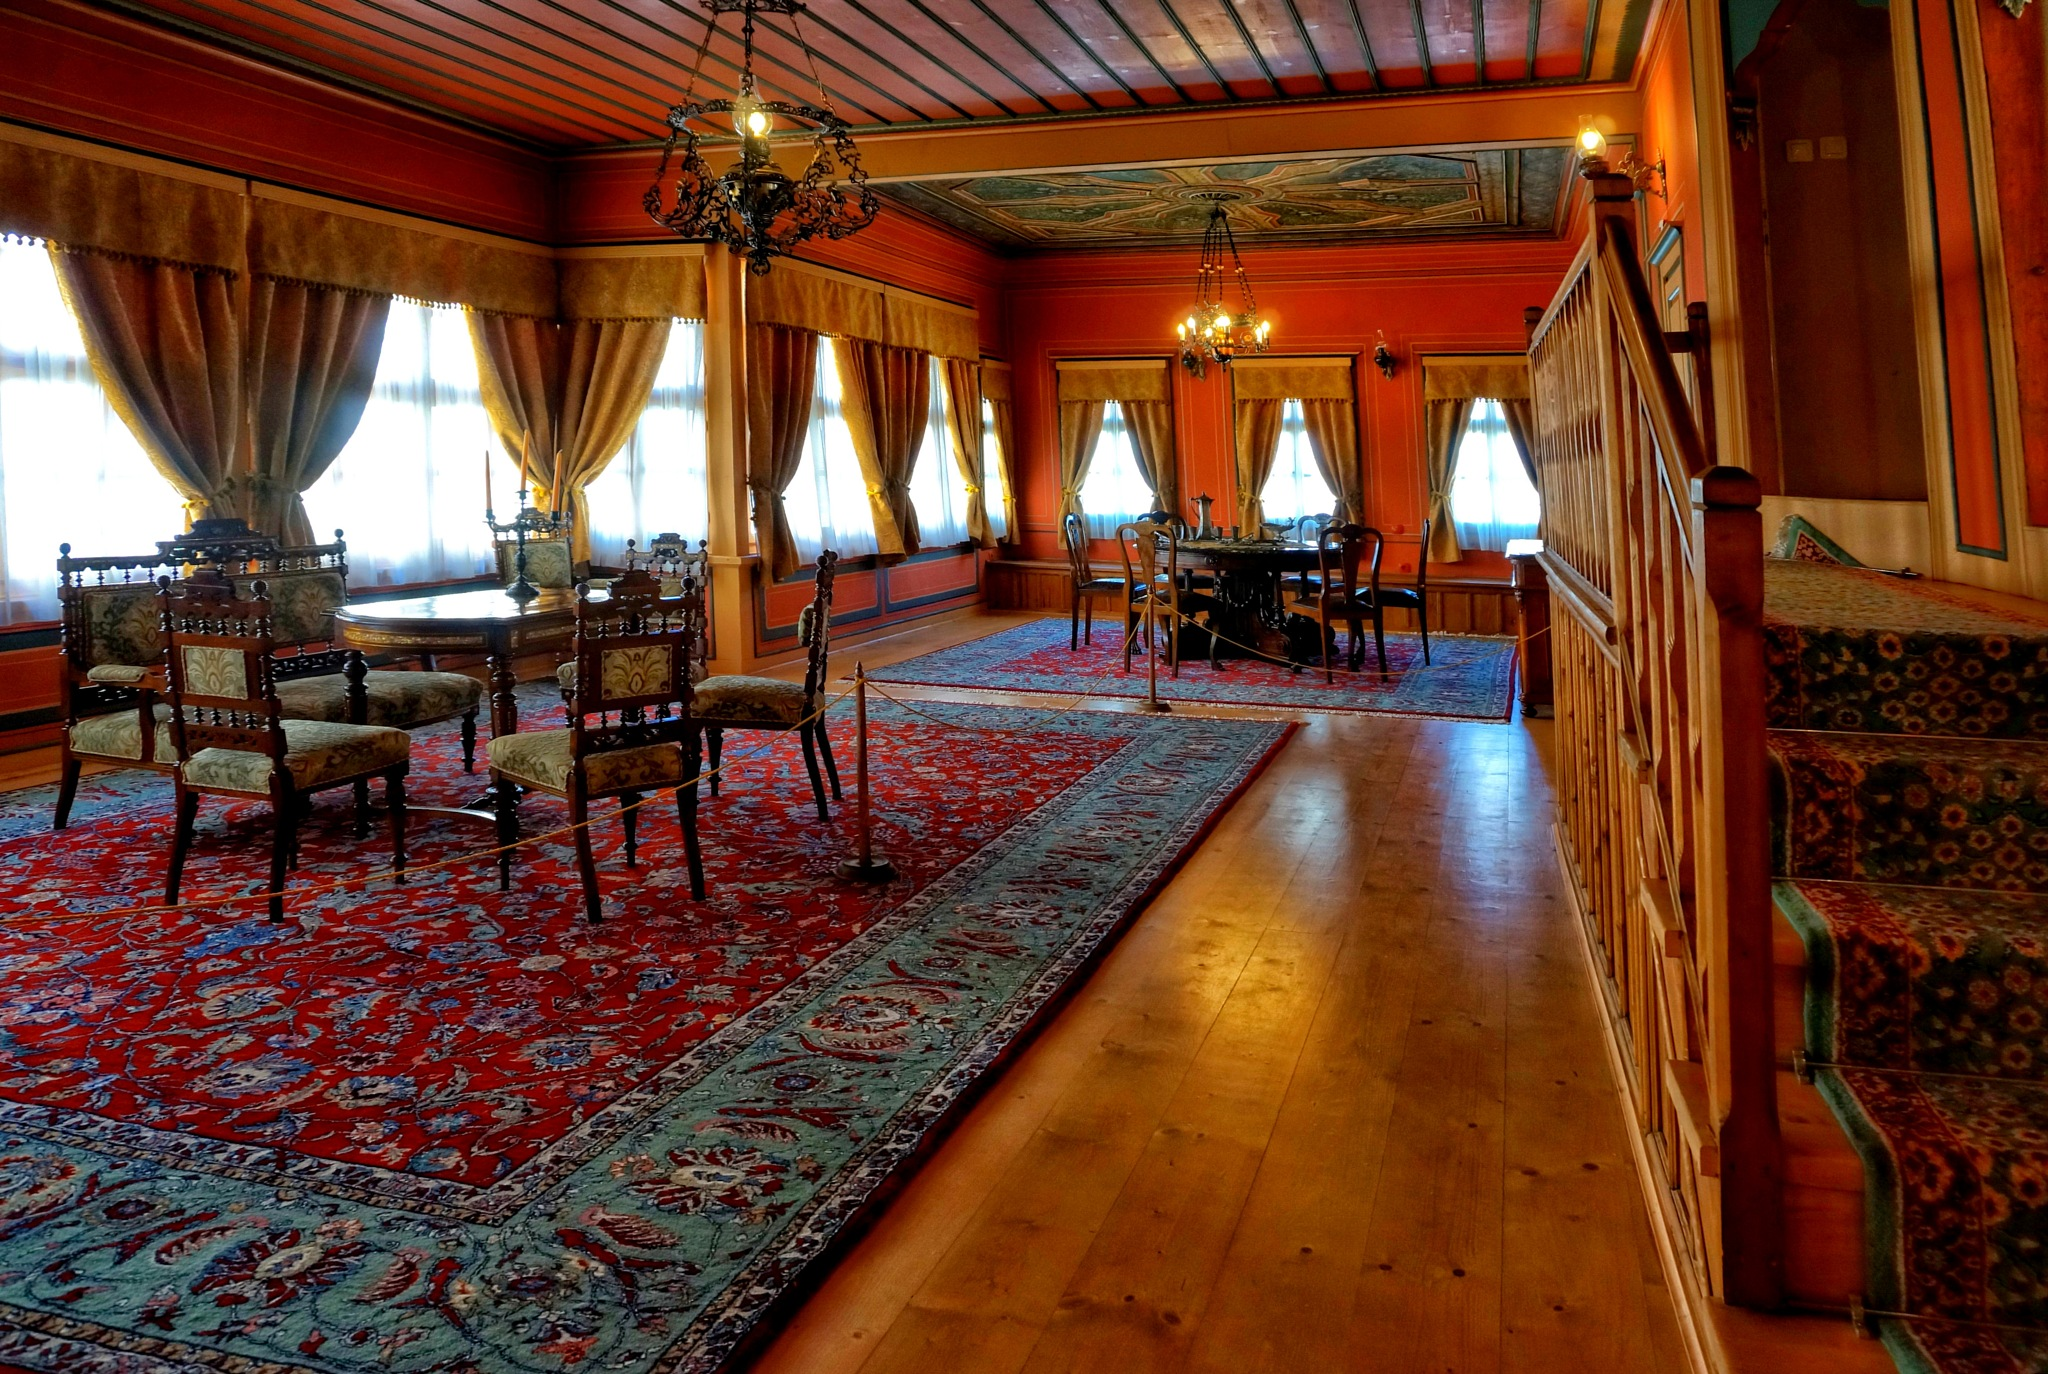 Klianti House - the red room by MariyaPhilipova